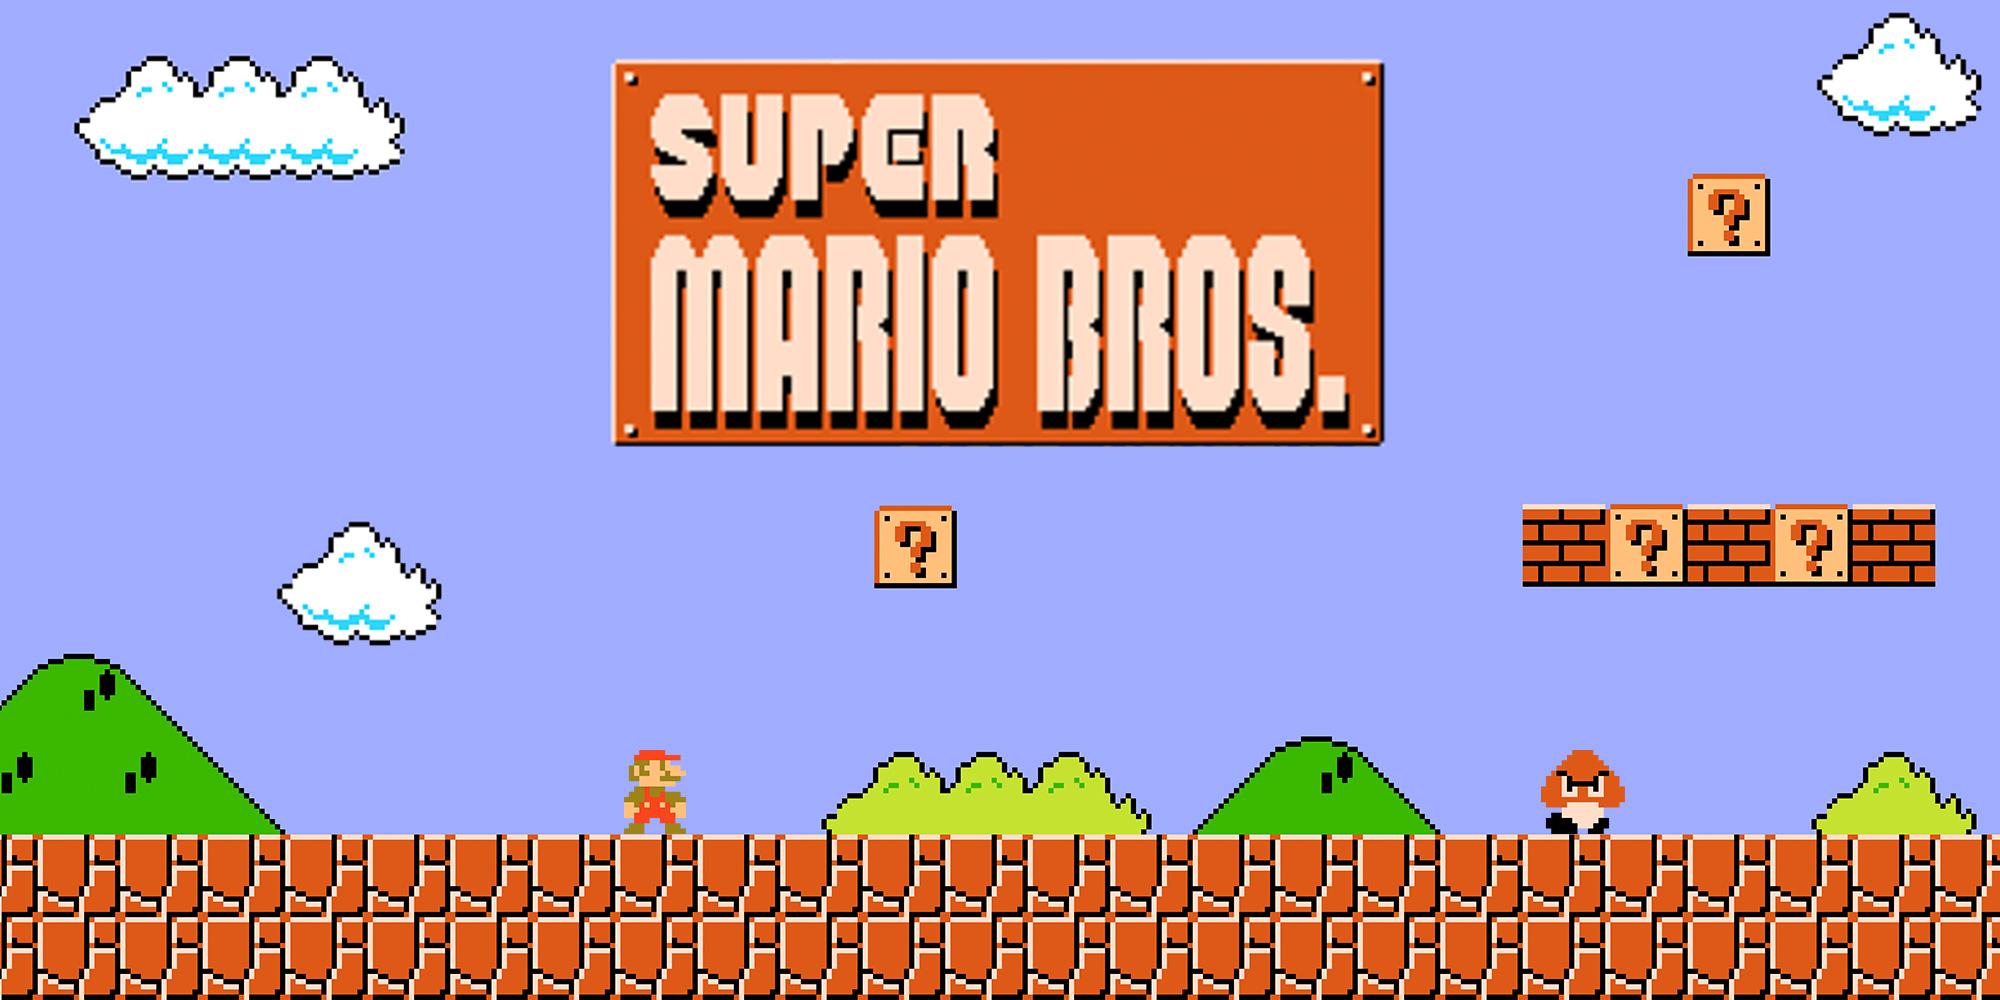 Super Mario or Super Mario Bros Video Game